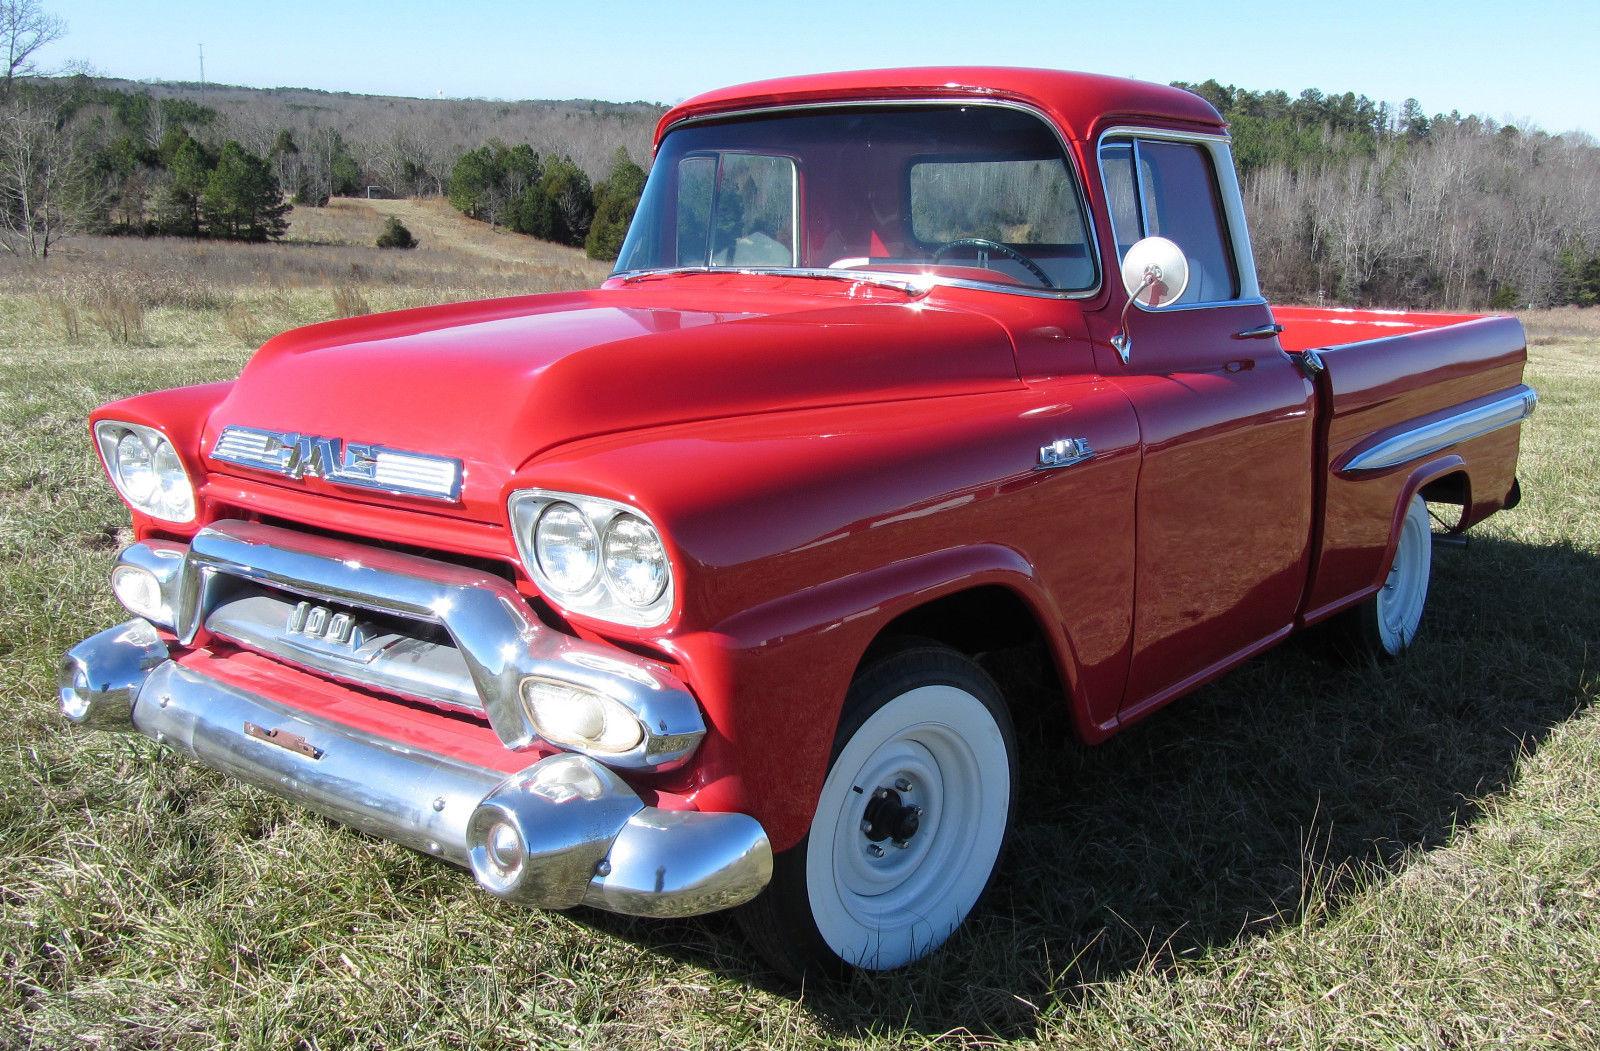 1958 GMC Fleetside Pickup - Classic Truck - Classic GMC Other 1958 ...